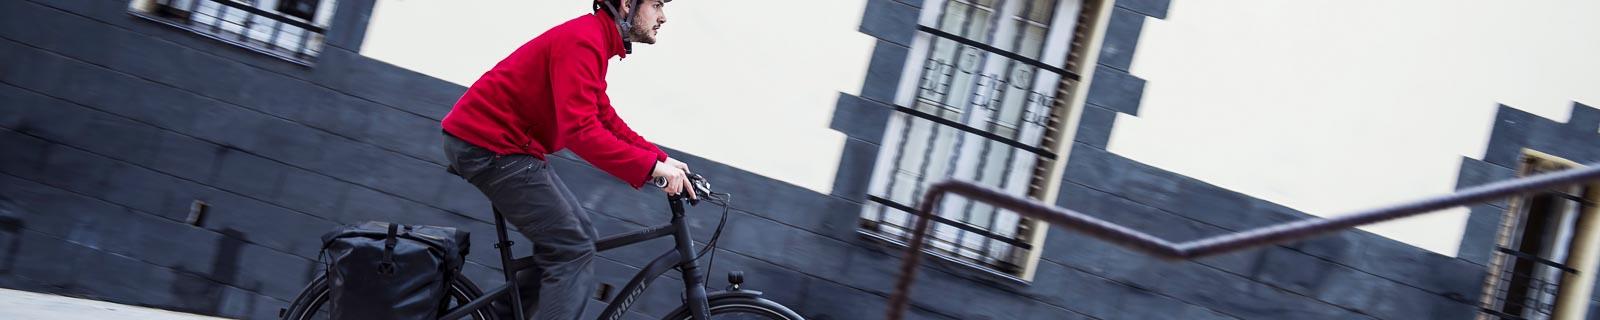 Bicicletas Trekking para hombres